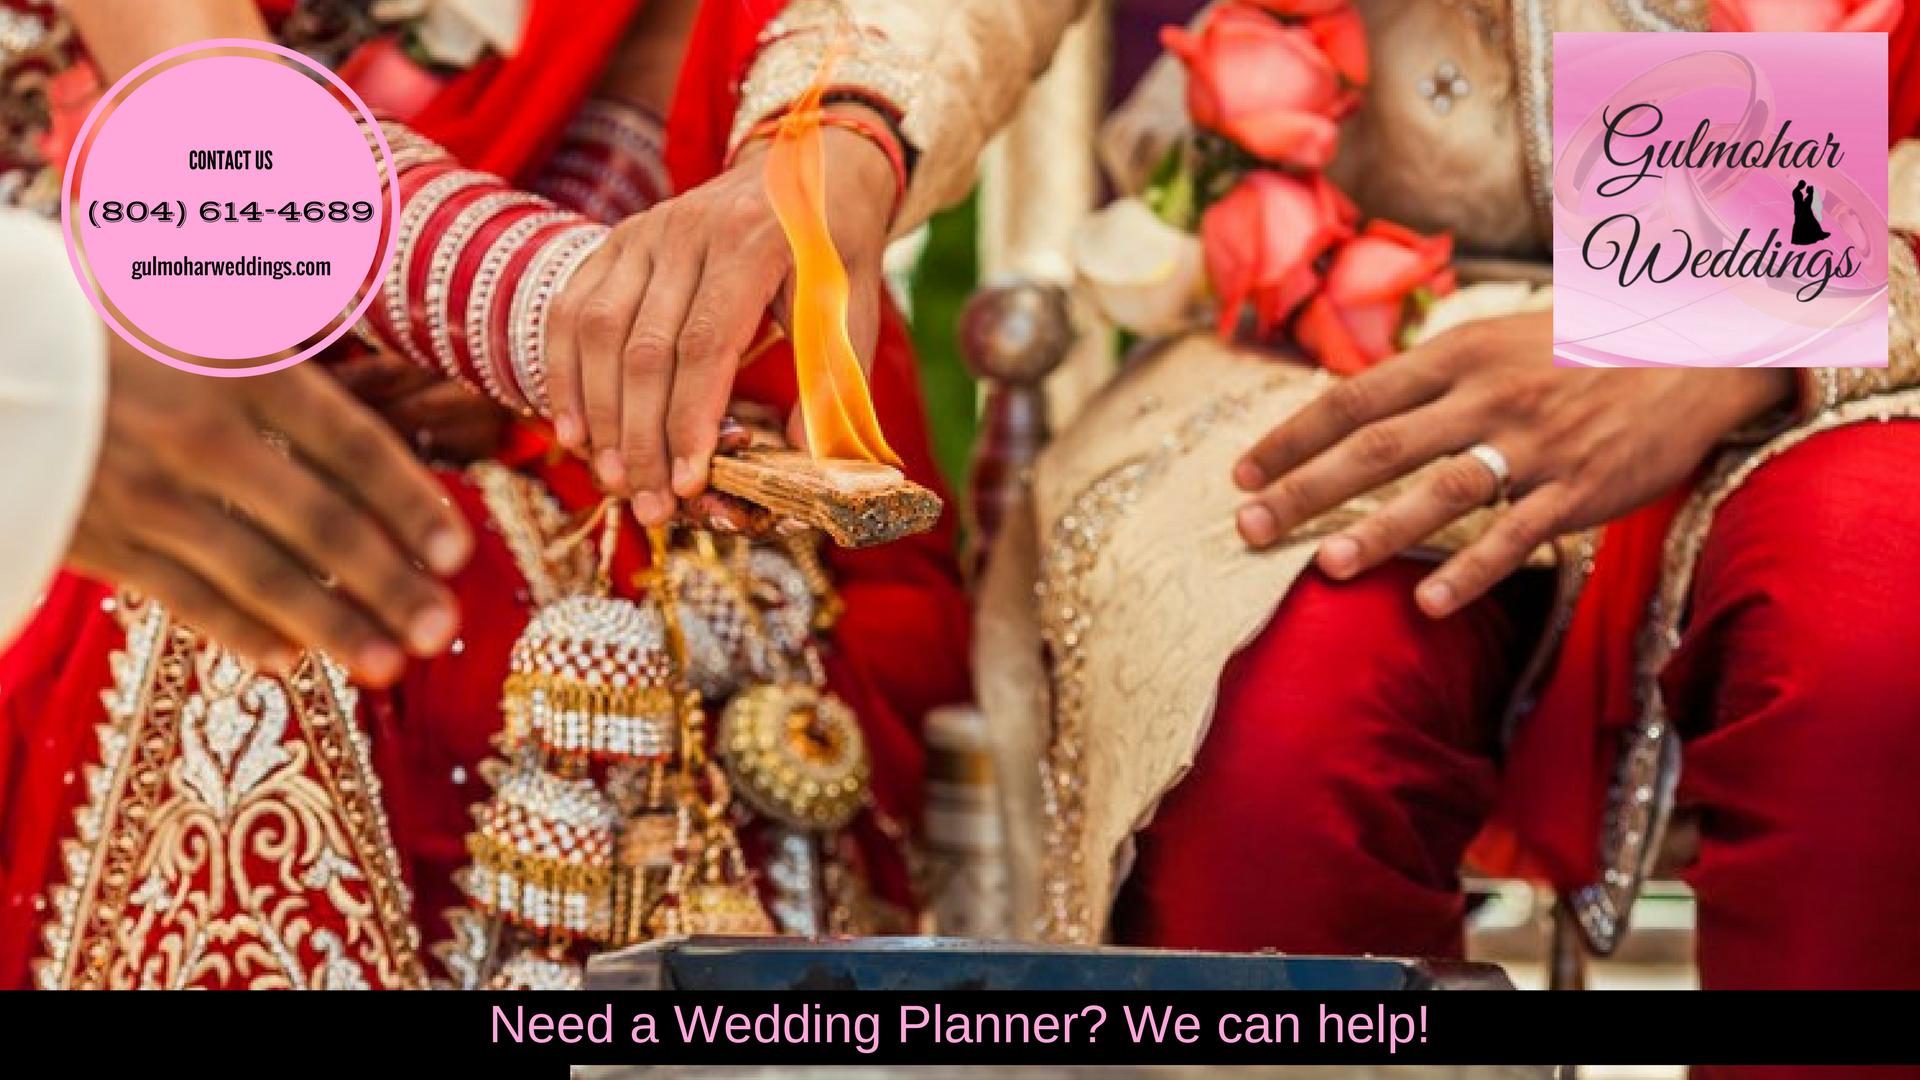 Indian Wedding Decorator In Richmond Va Indian Wedding Decorator In Virginia Beach Va Indian Wedding D Asian Wedding Decor Indian Wedding Planner Yacht Wedding